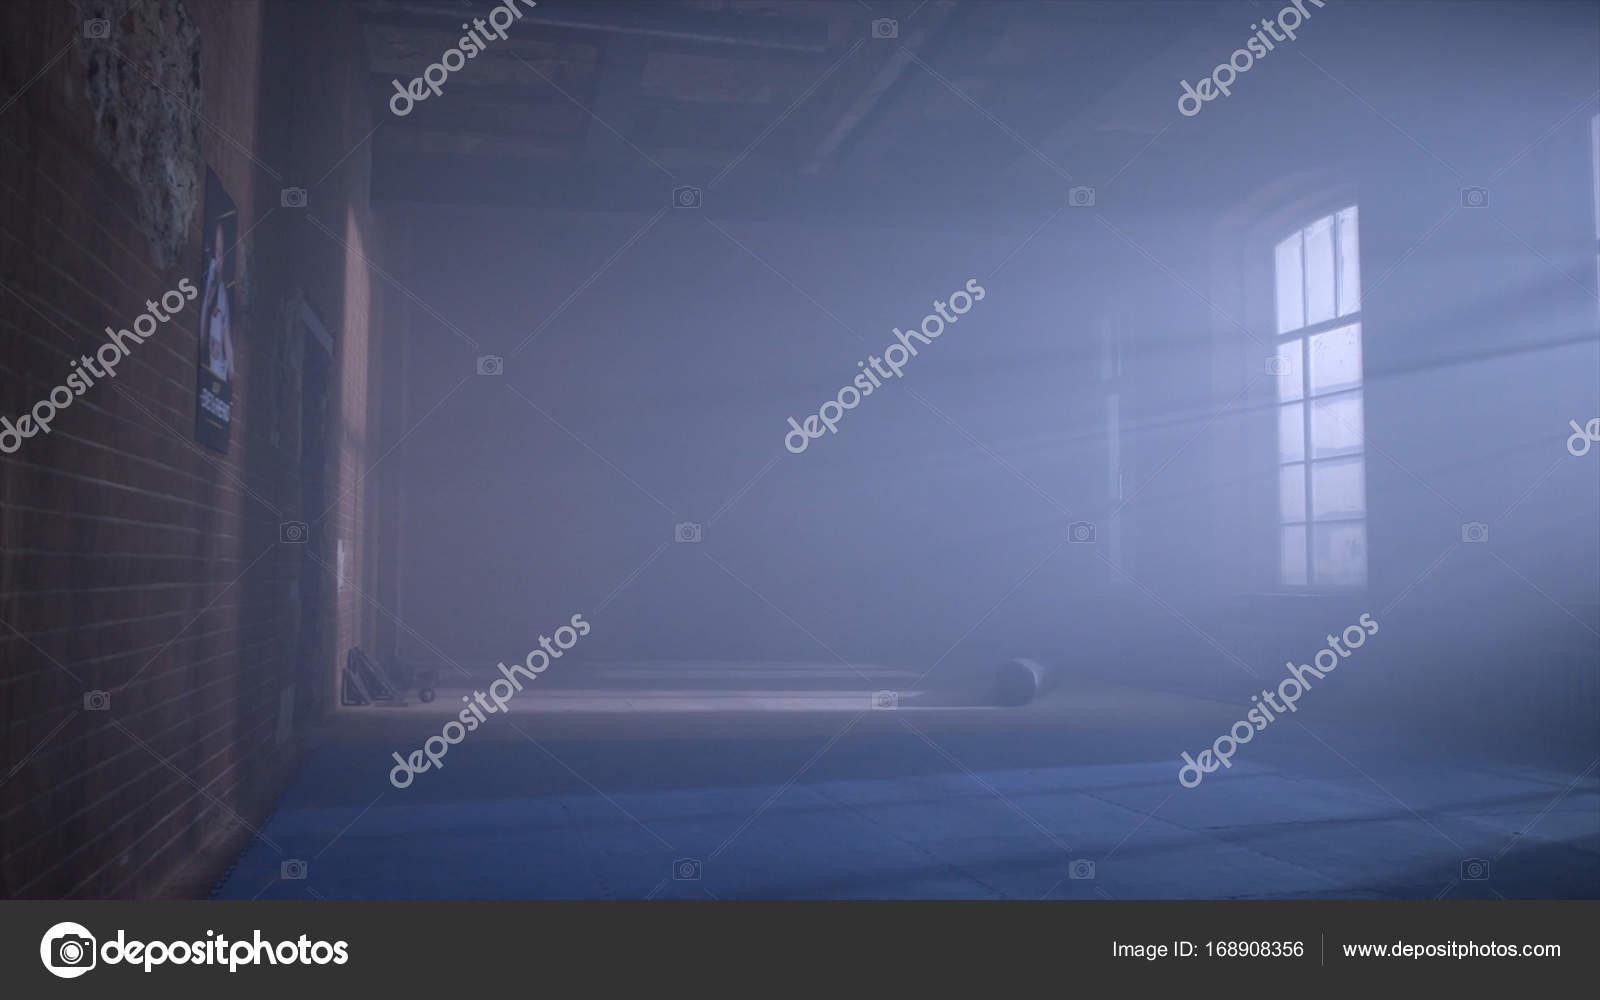 https://st3.depositphotos.com/11911276/16890/i/1600/depositphotos_168908356-stock-photo-gym-in-the-basement-interior.jpg